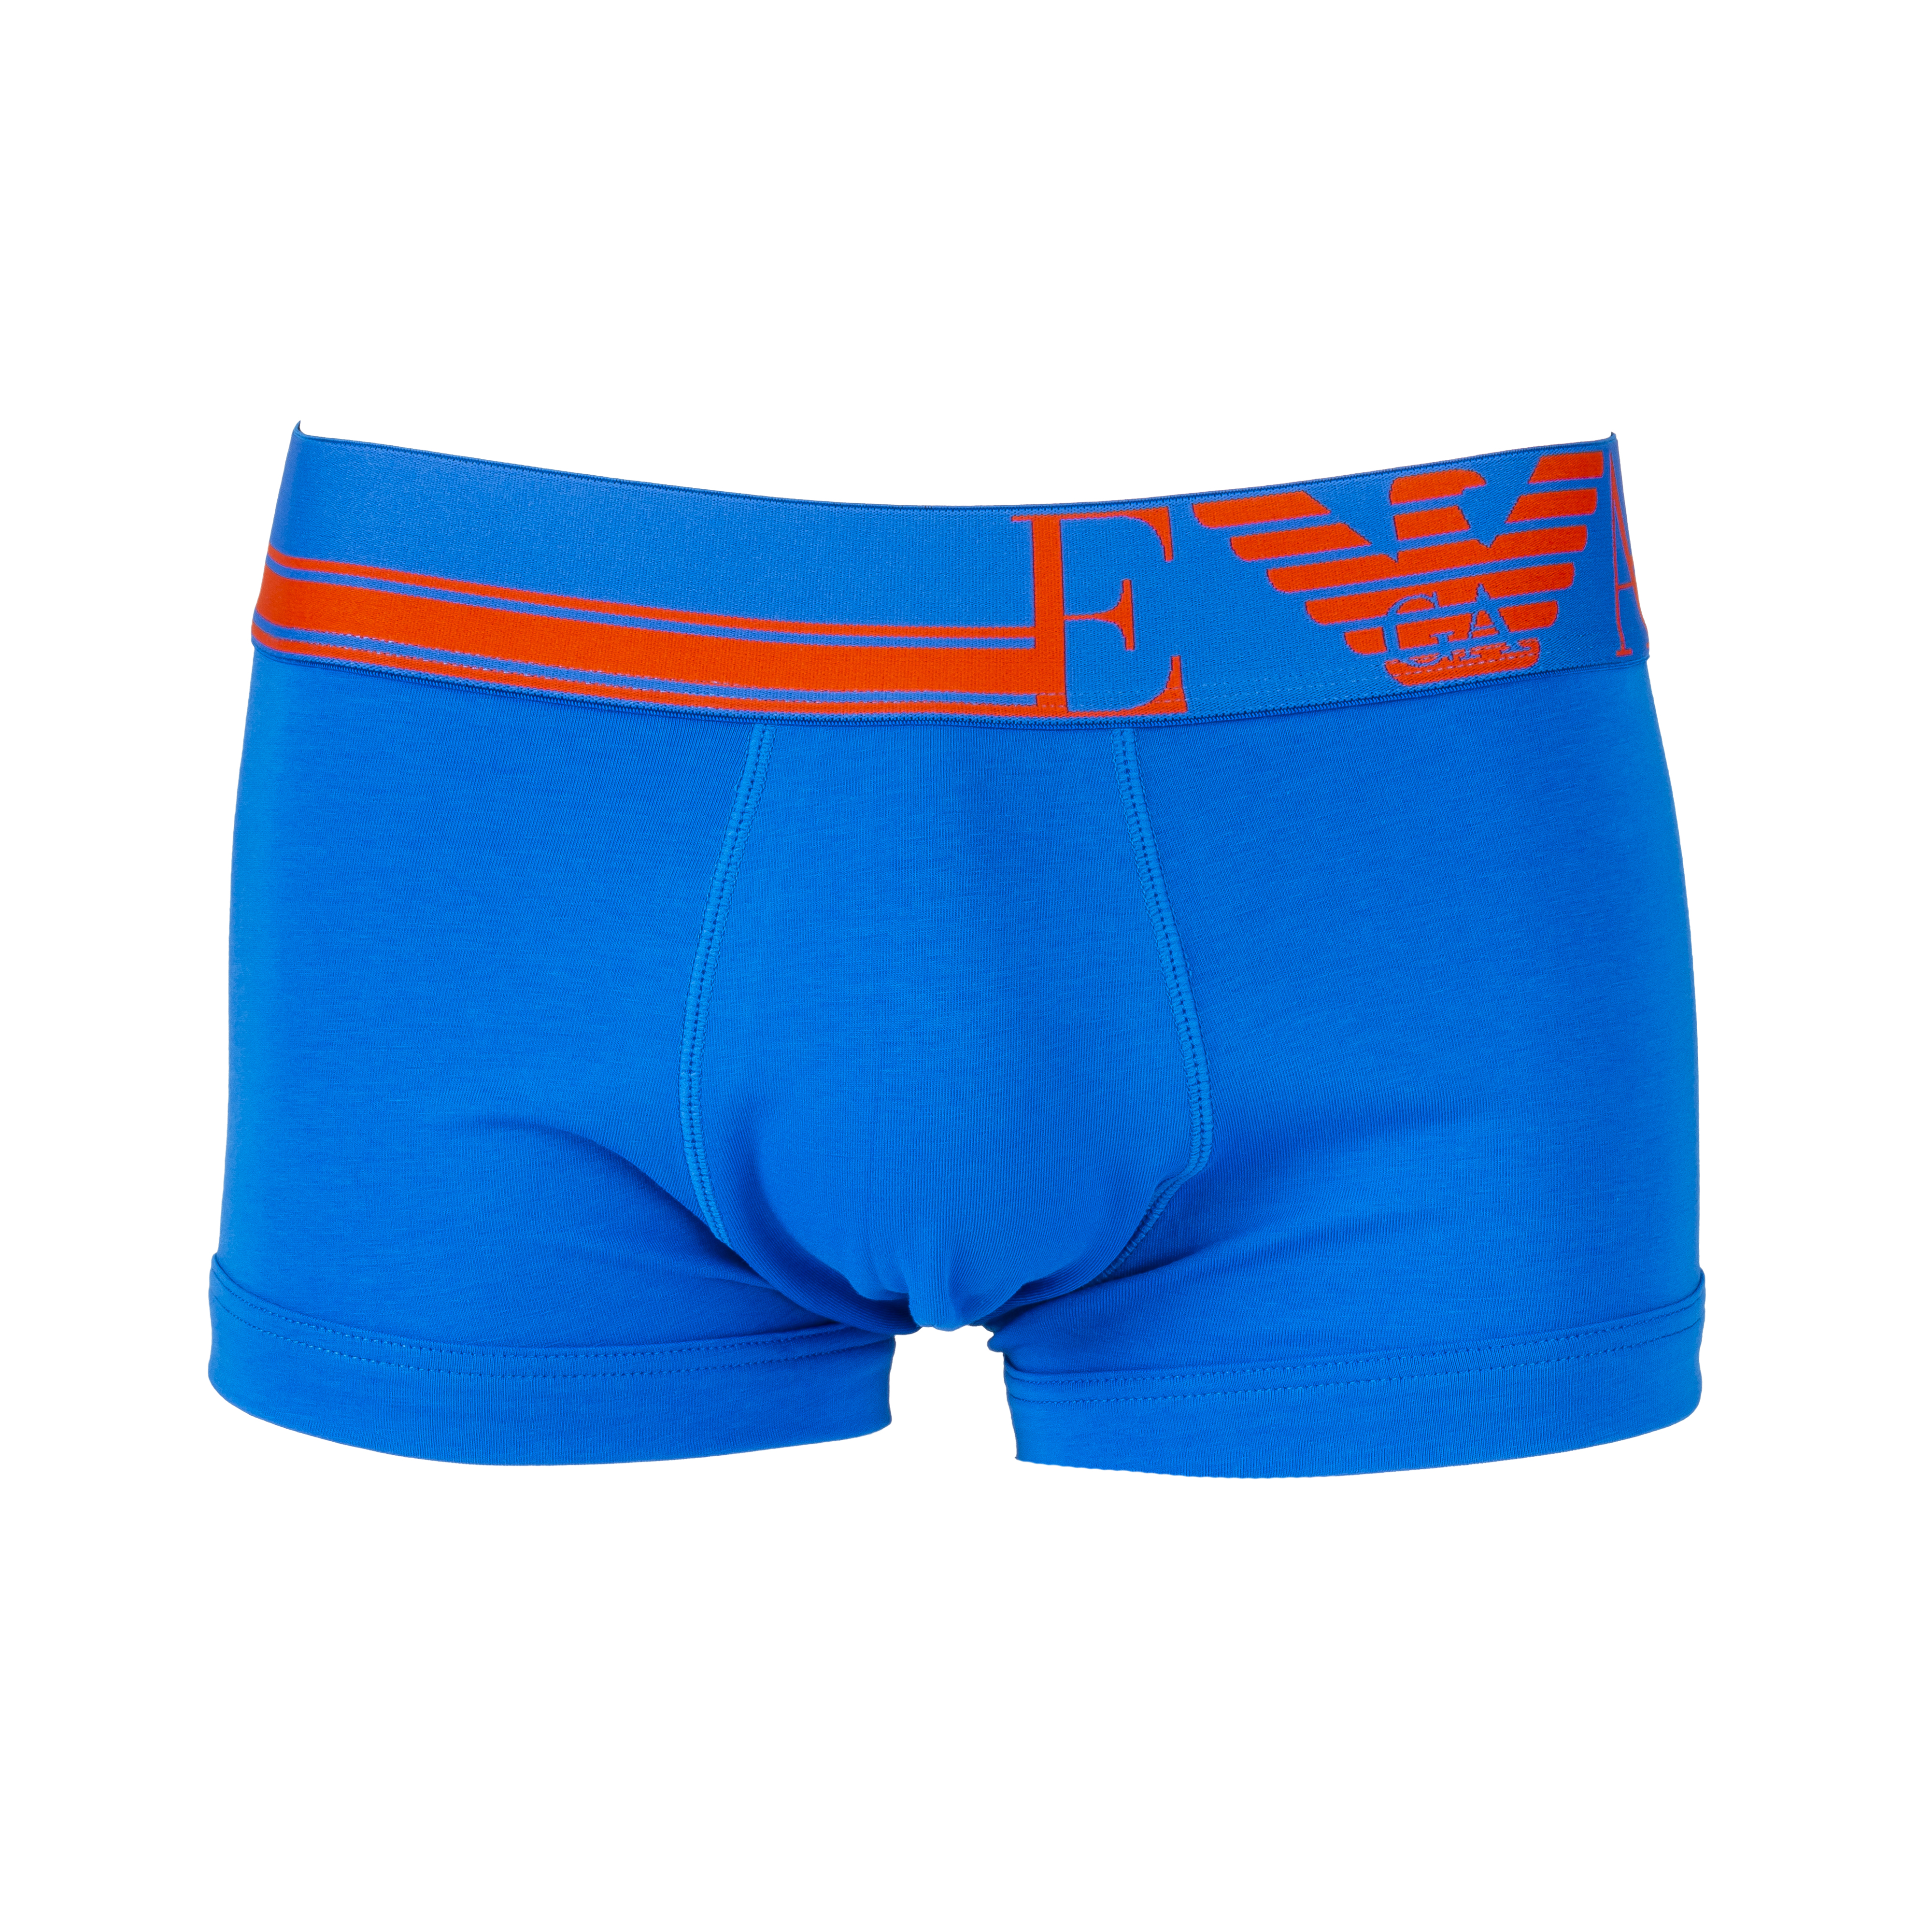 Boxer  en coton stretch bleu pétrole